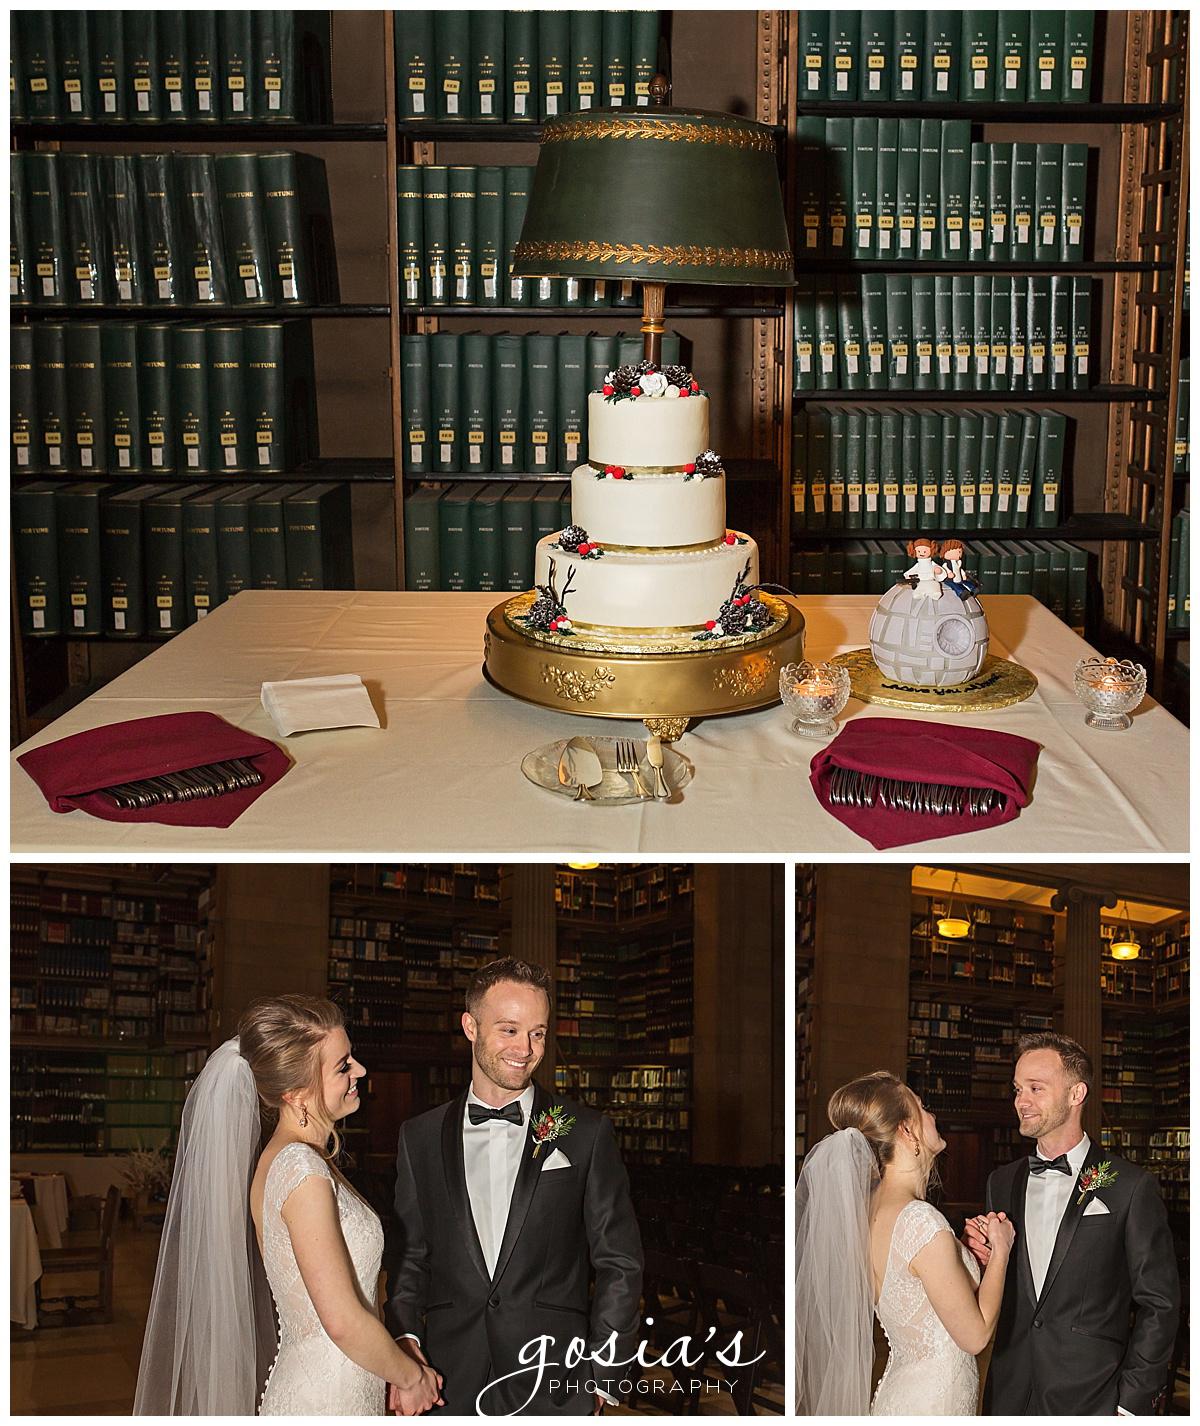 Gosias-Photography-Appleton-wedding-photographer-Saint-Paul-James-J-Hill-Center-ceremony-reception-Minnesota-_0051.jpg